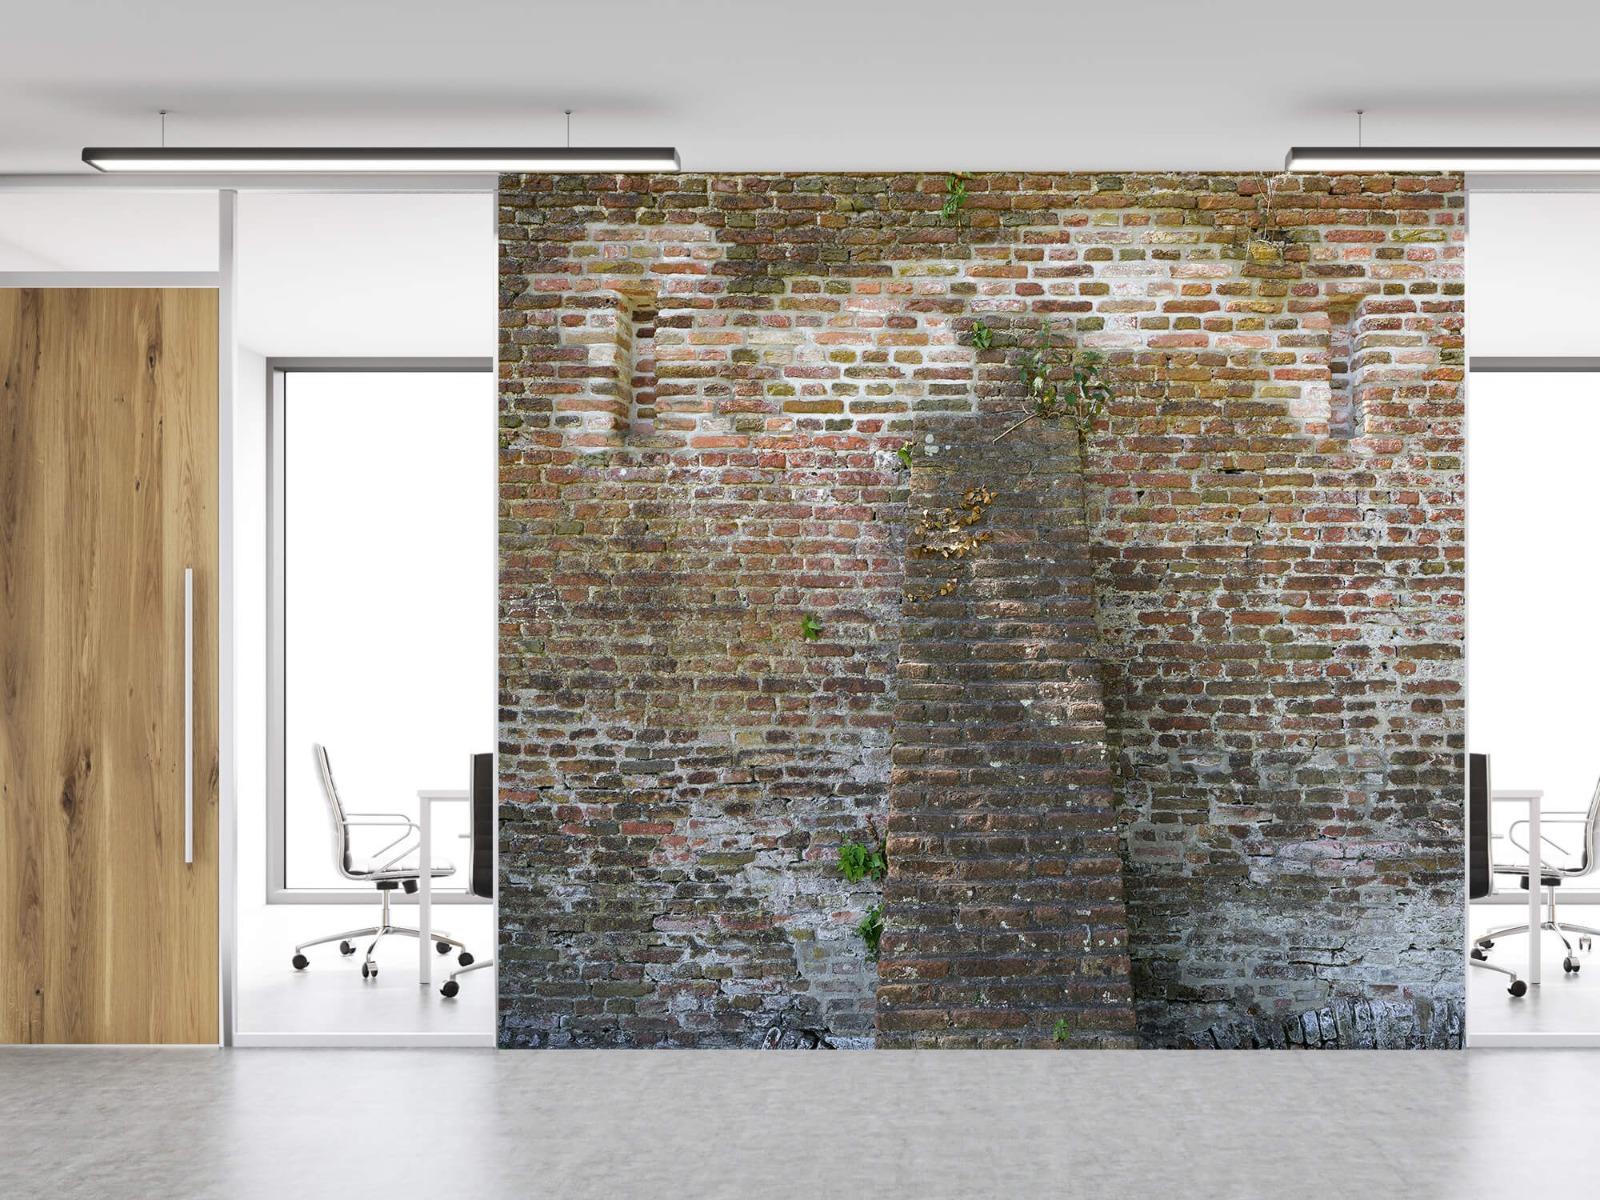 Stenen - Verweerde stadsmuur 11